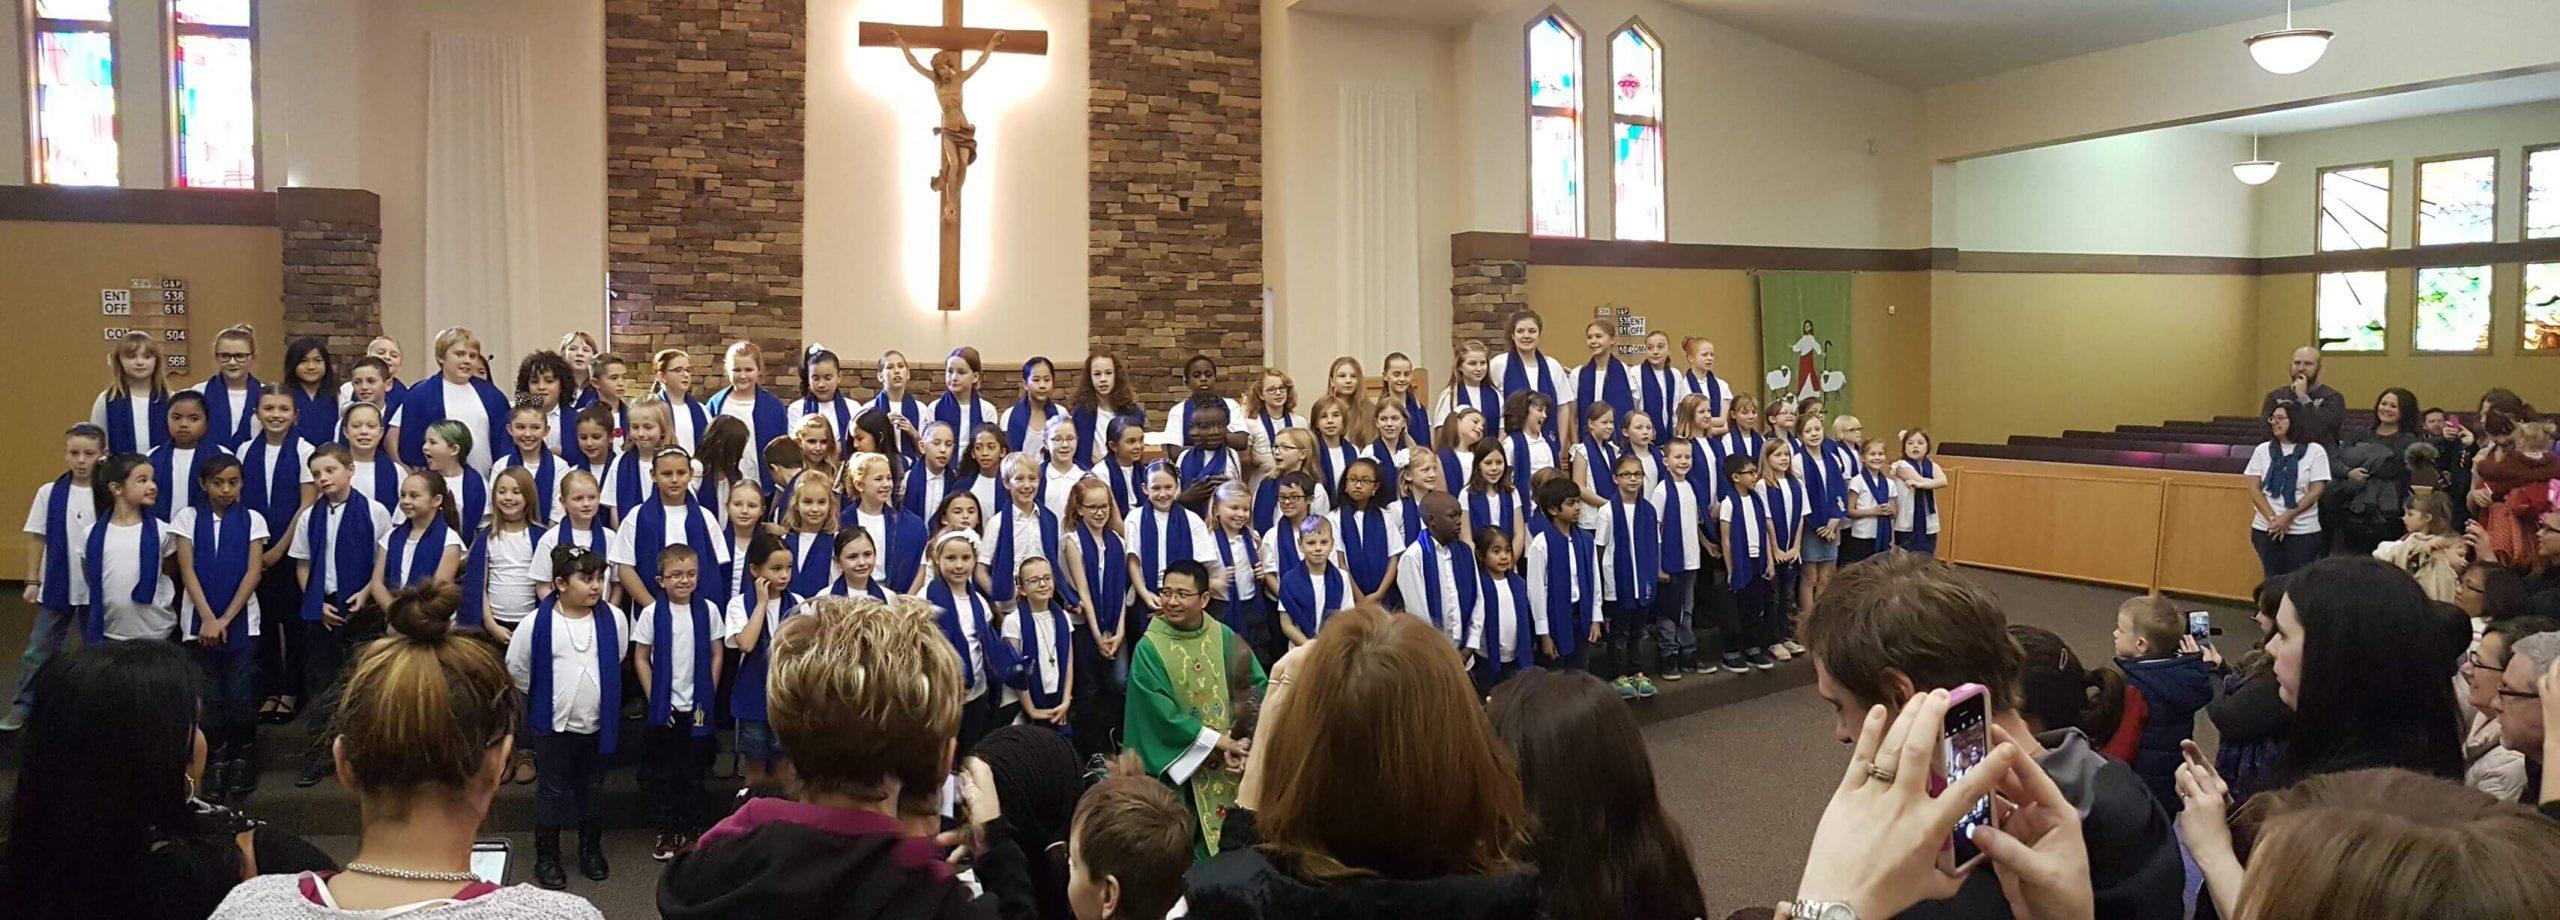 CCSD-Calgary Catholic-SCHOOL-6